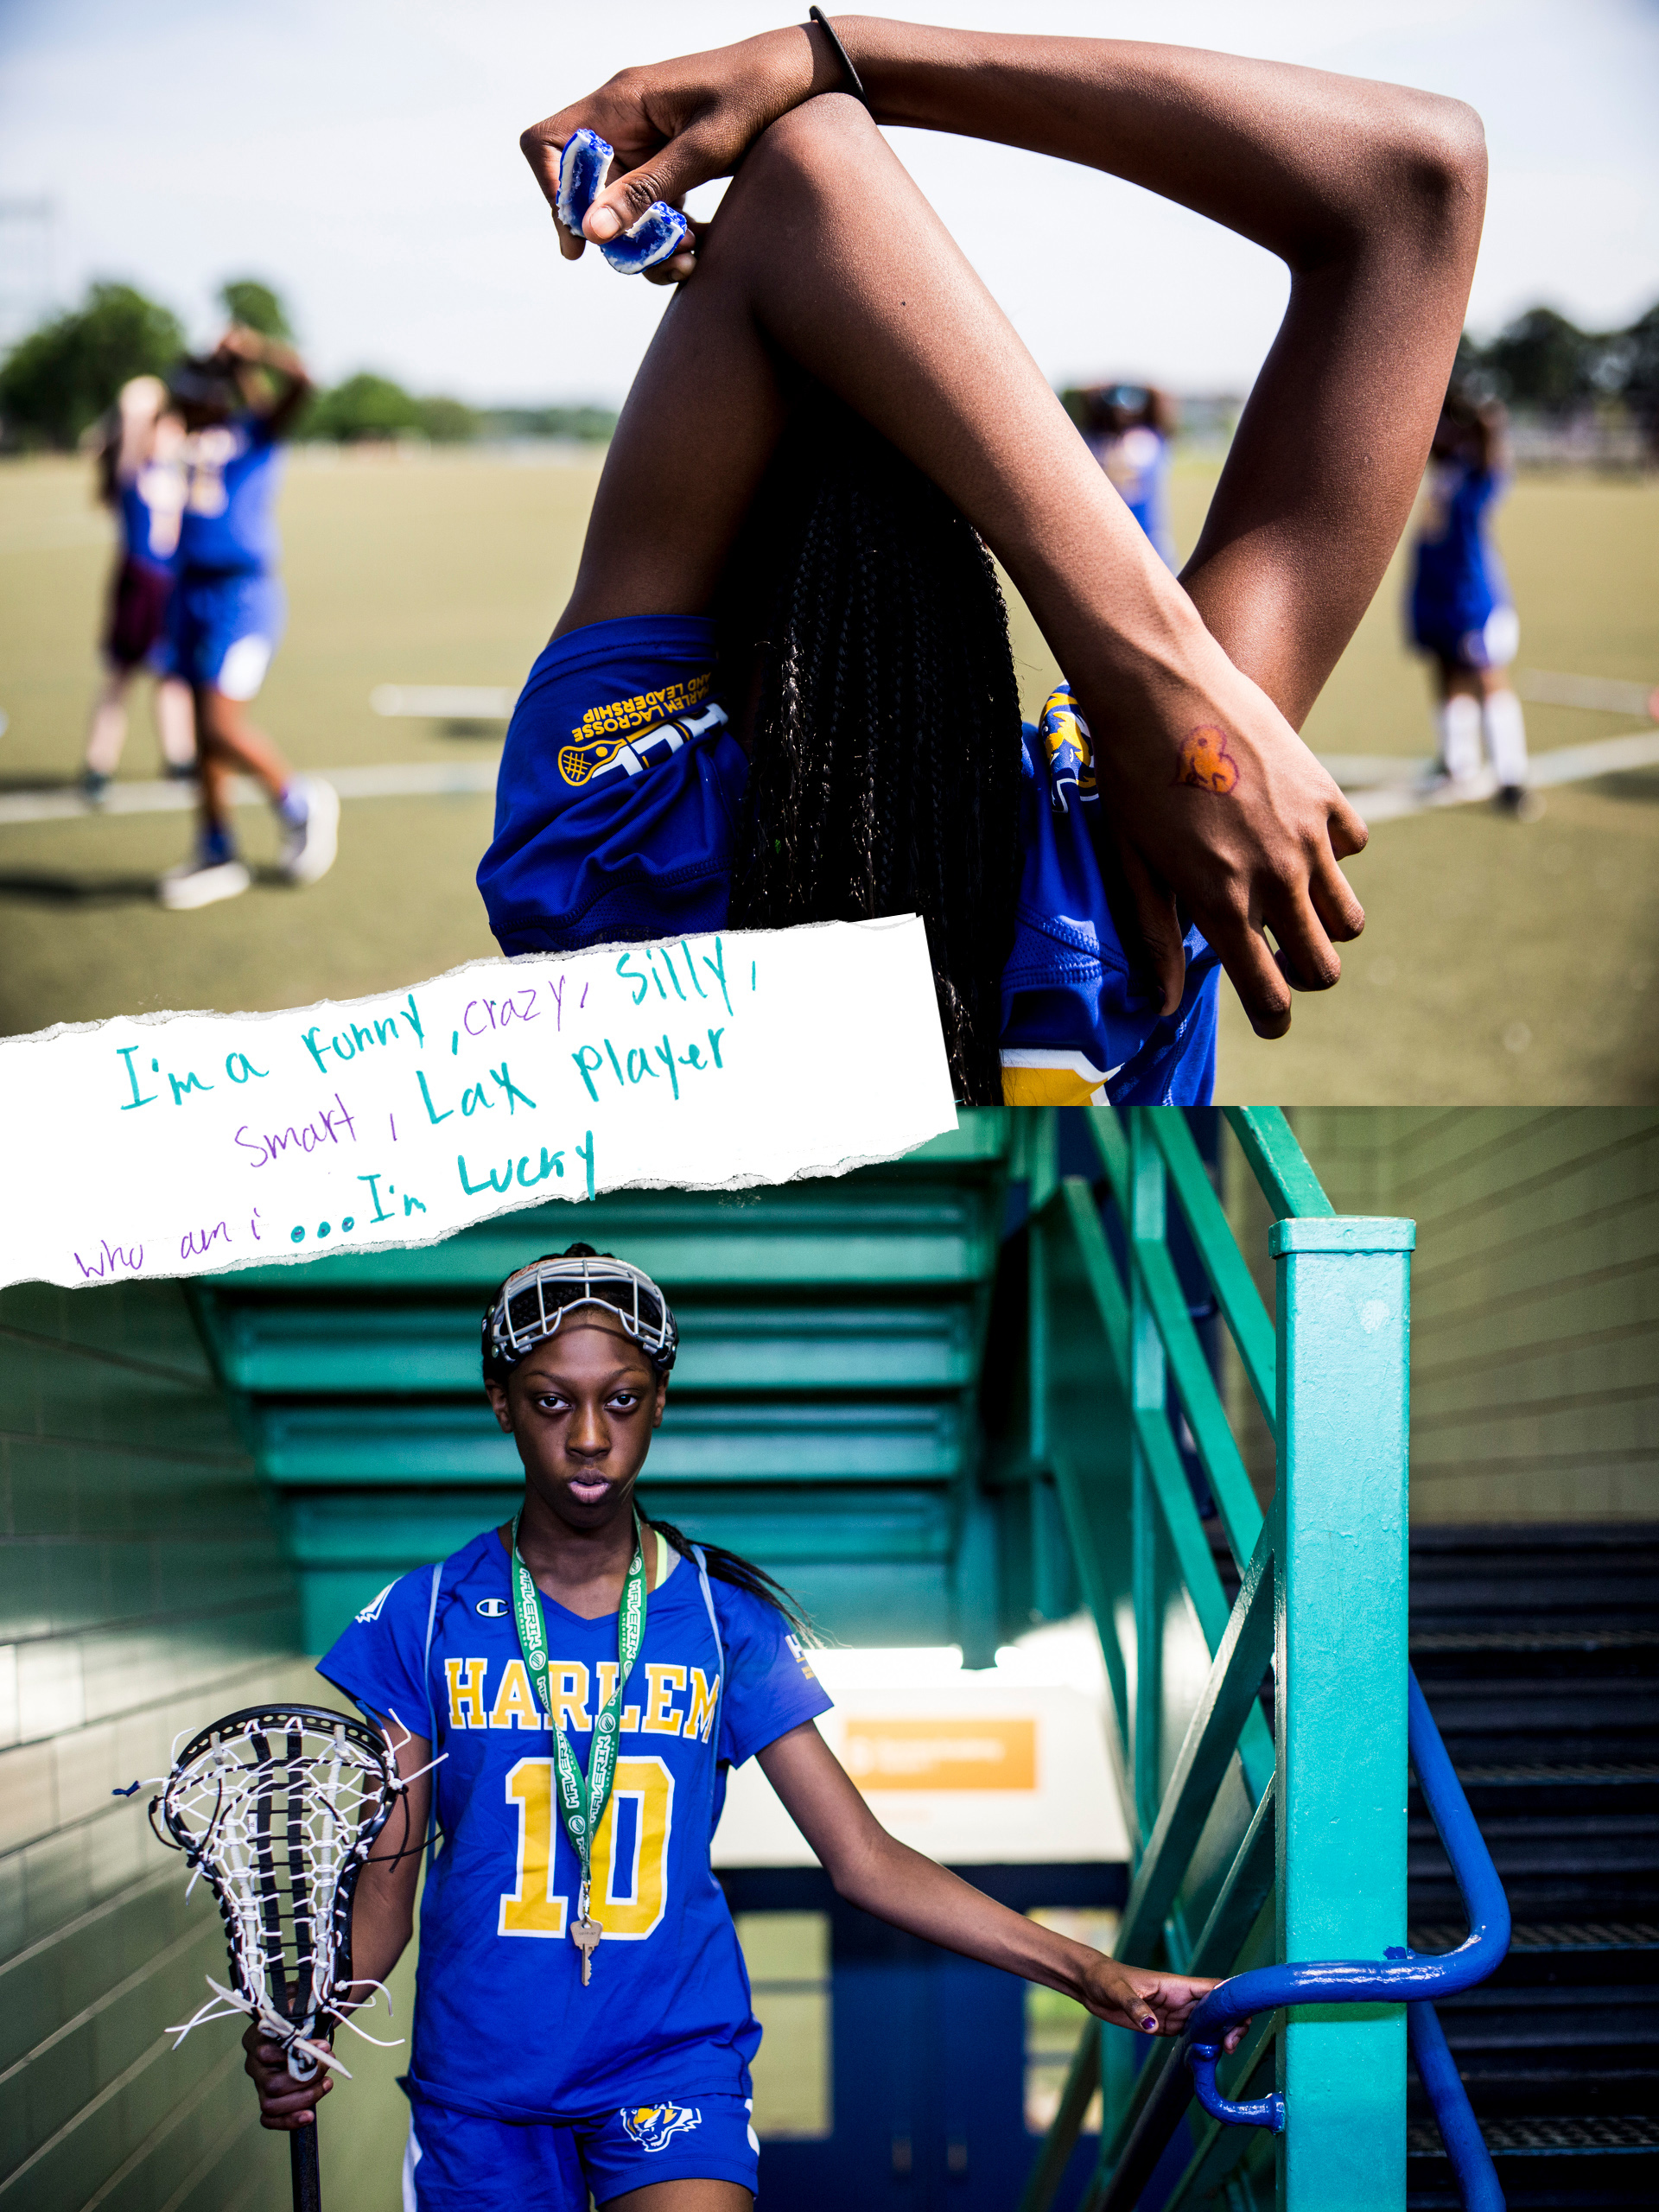 Harlem. Lacrosse. Search it Up